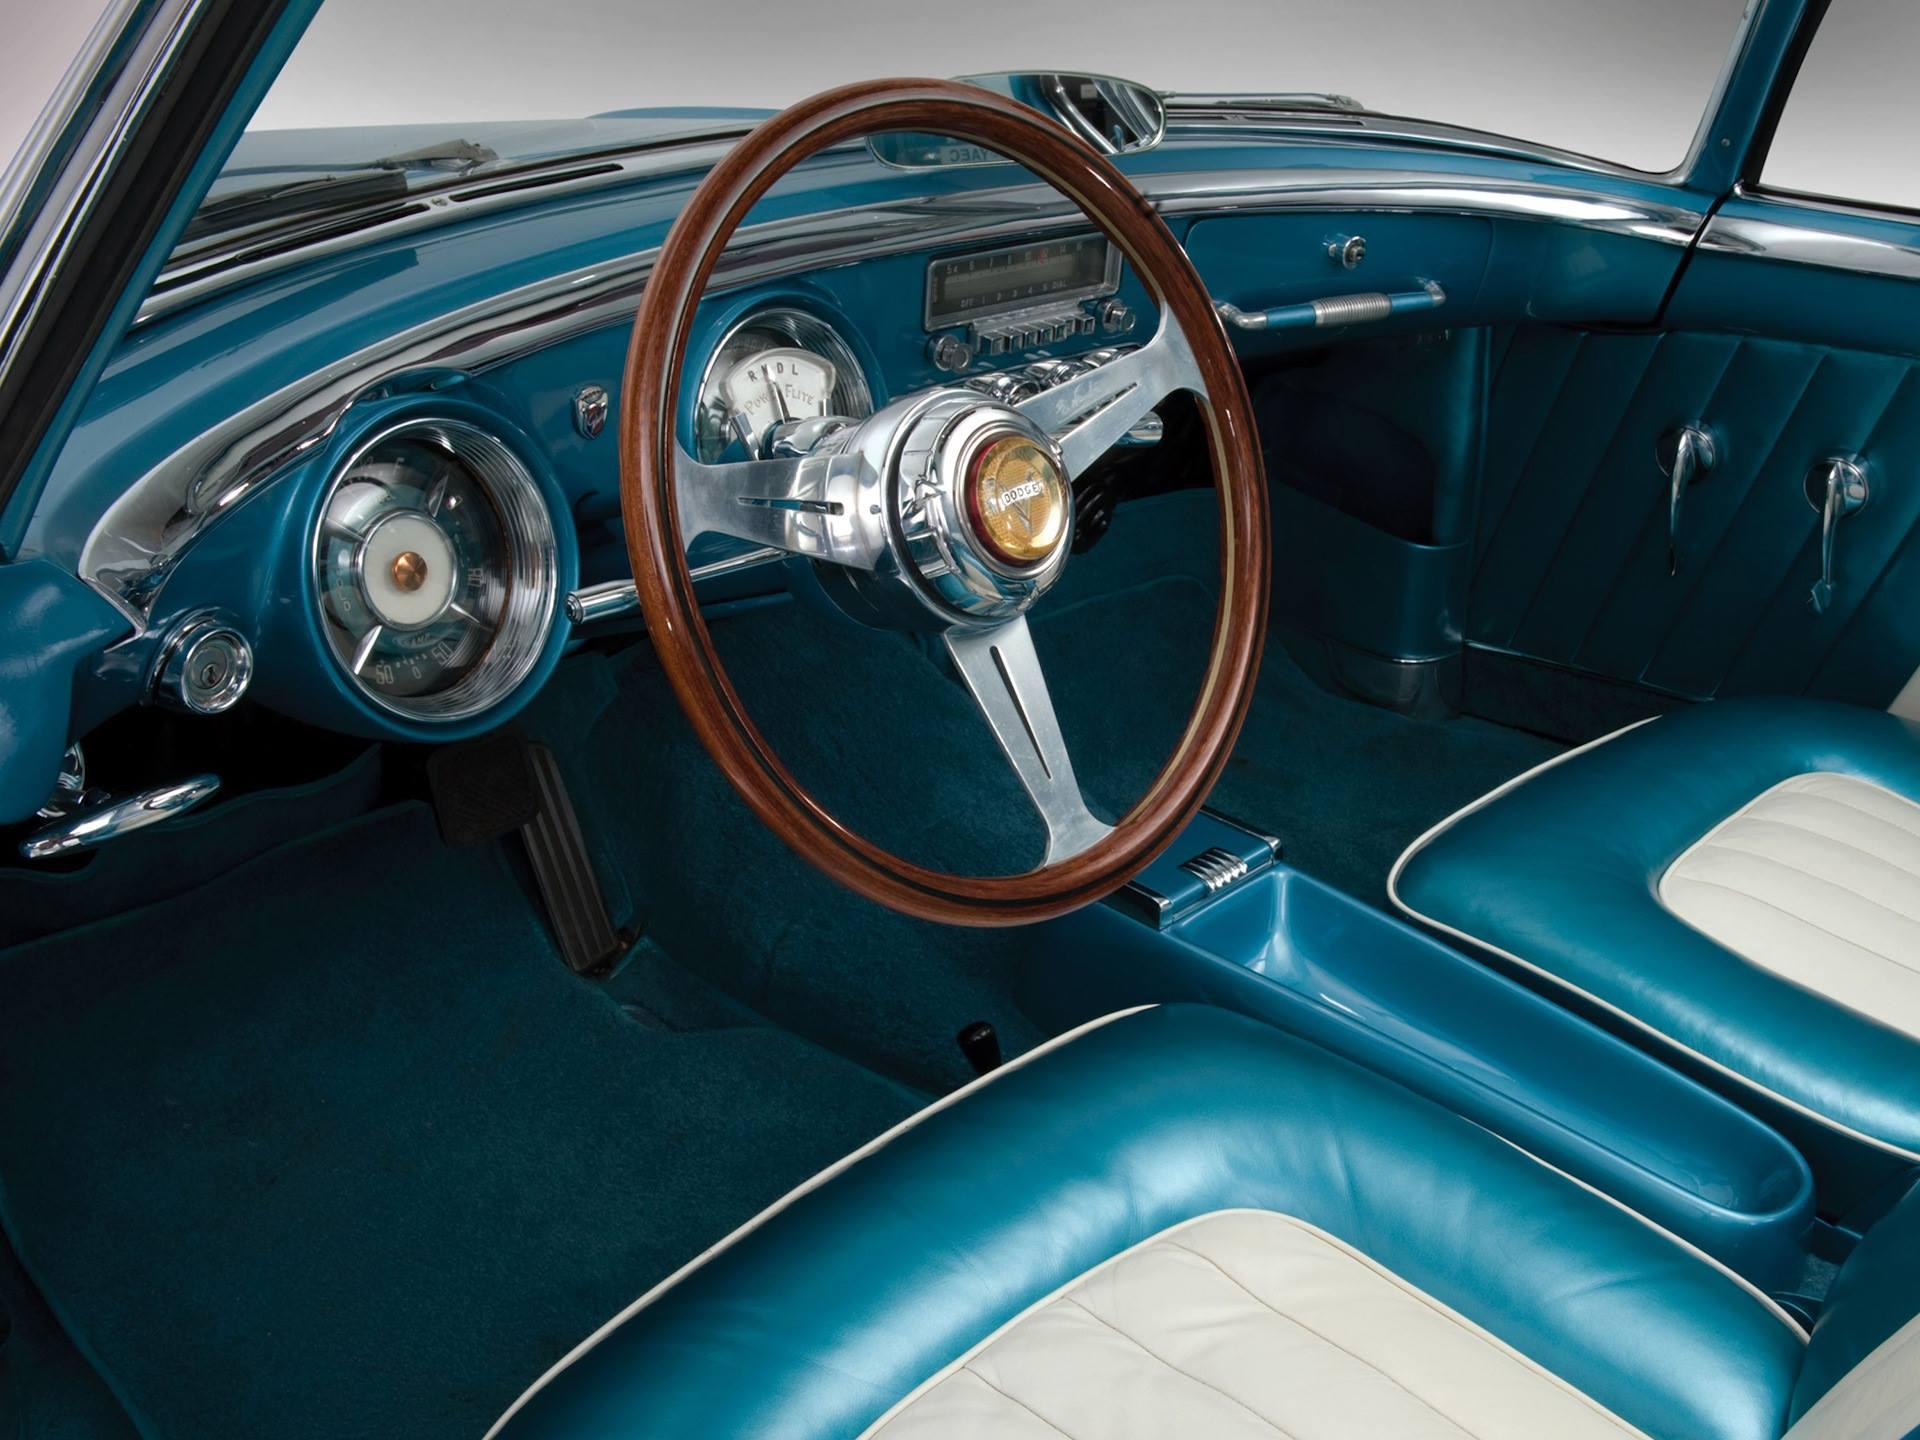 Dodge-Firearrow-III-Sport-Coupe-1954-3